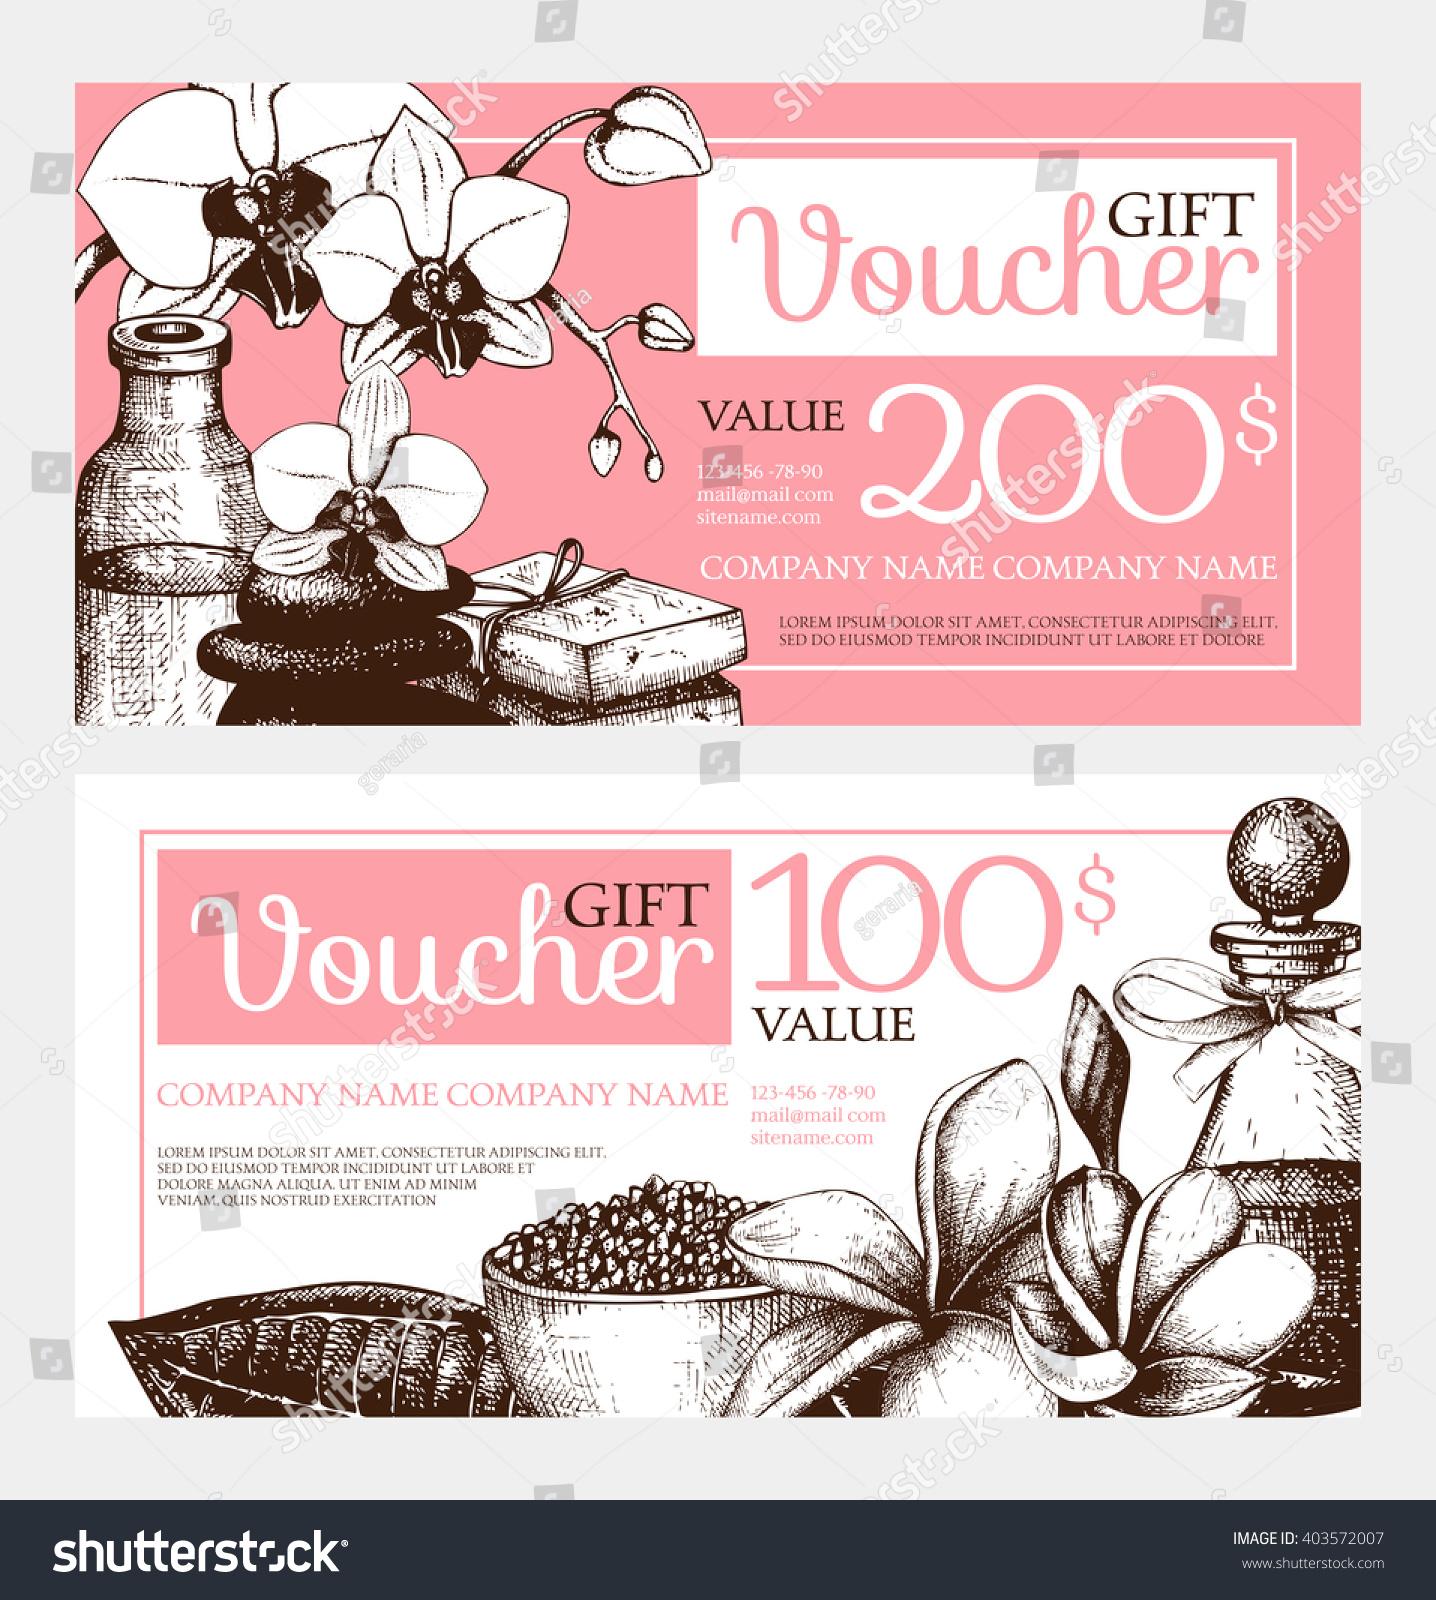 Vector Gift Voucher Design Hand Drawn Stock Vector 403572007 - Shutterstock